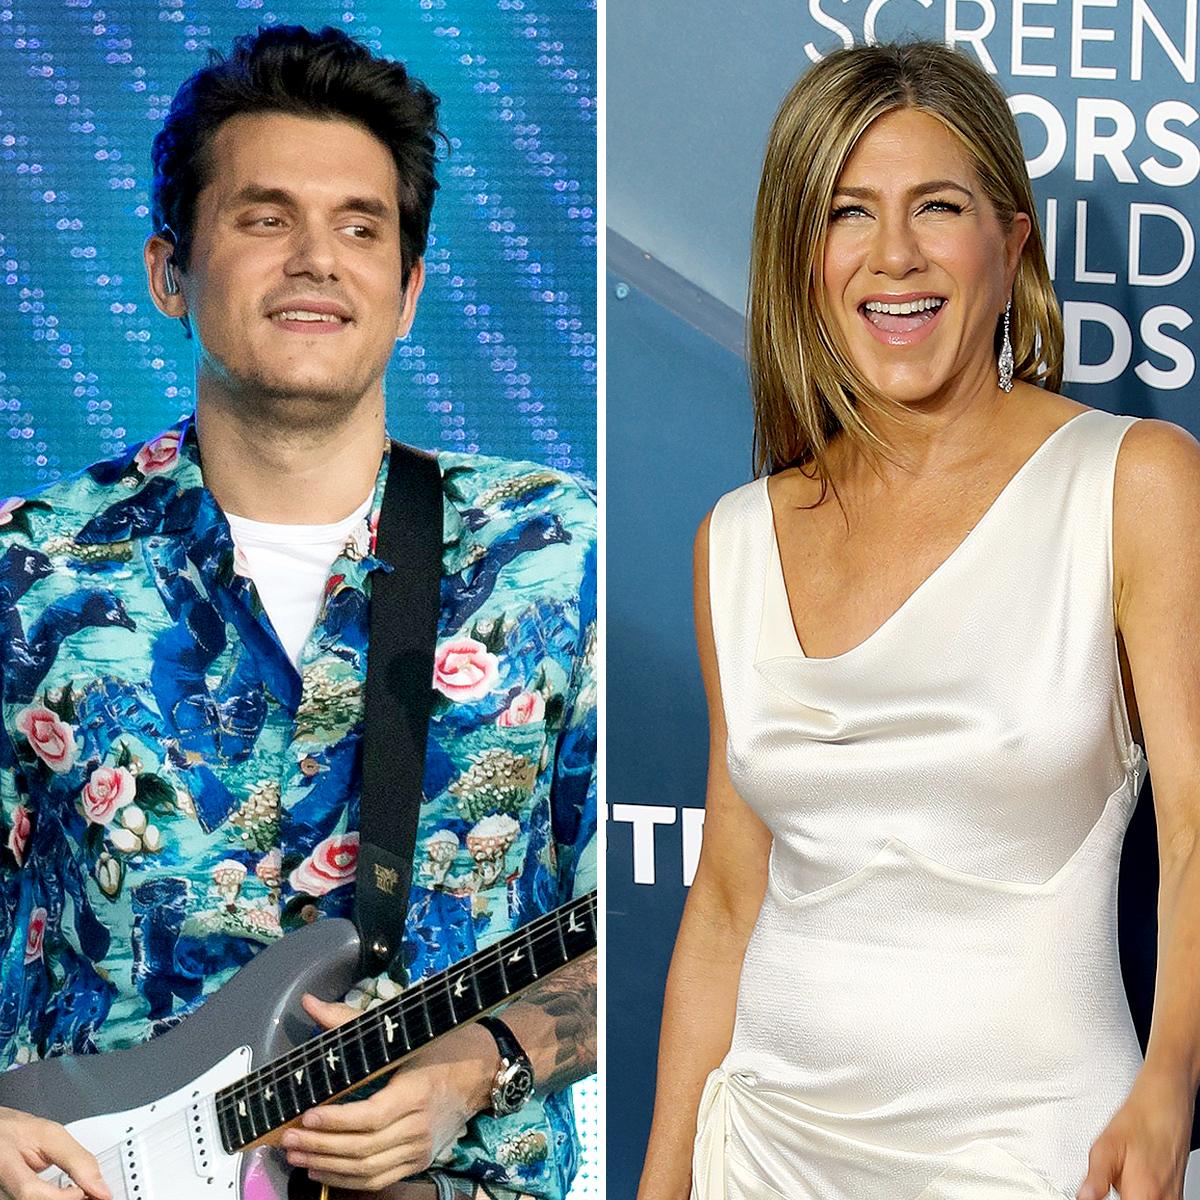 John Mayer Really Made Ex Jennifer Aniston Laugh on Instagram Live 2